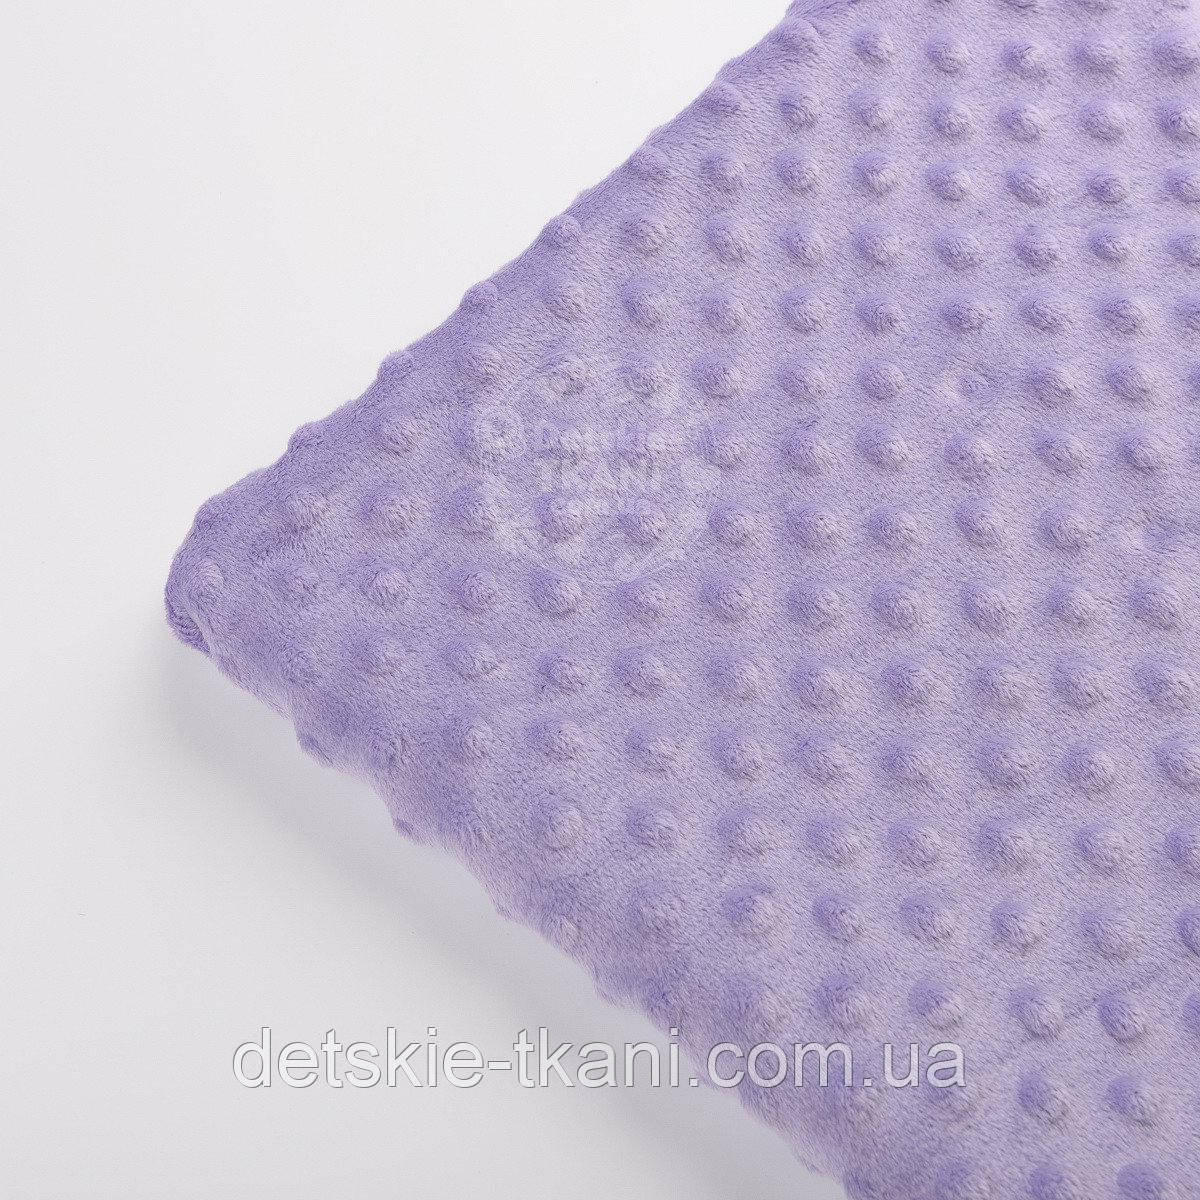 Три лоскута плюша minky М-31 лавандового цвета, размер 30*40 см